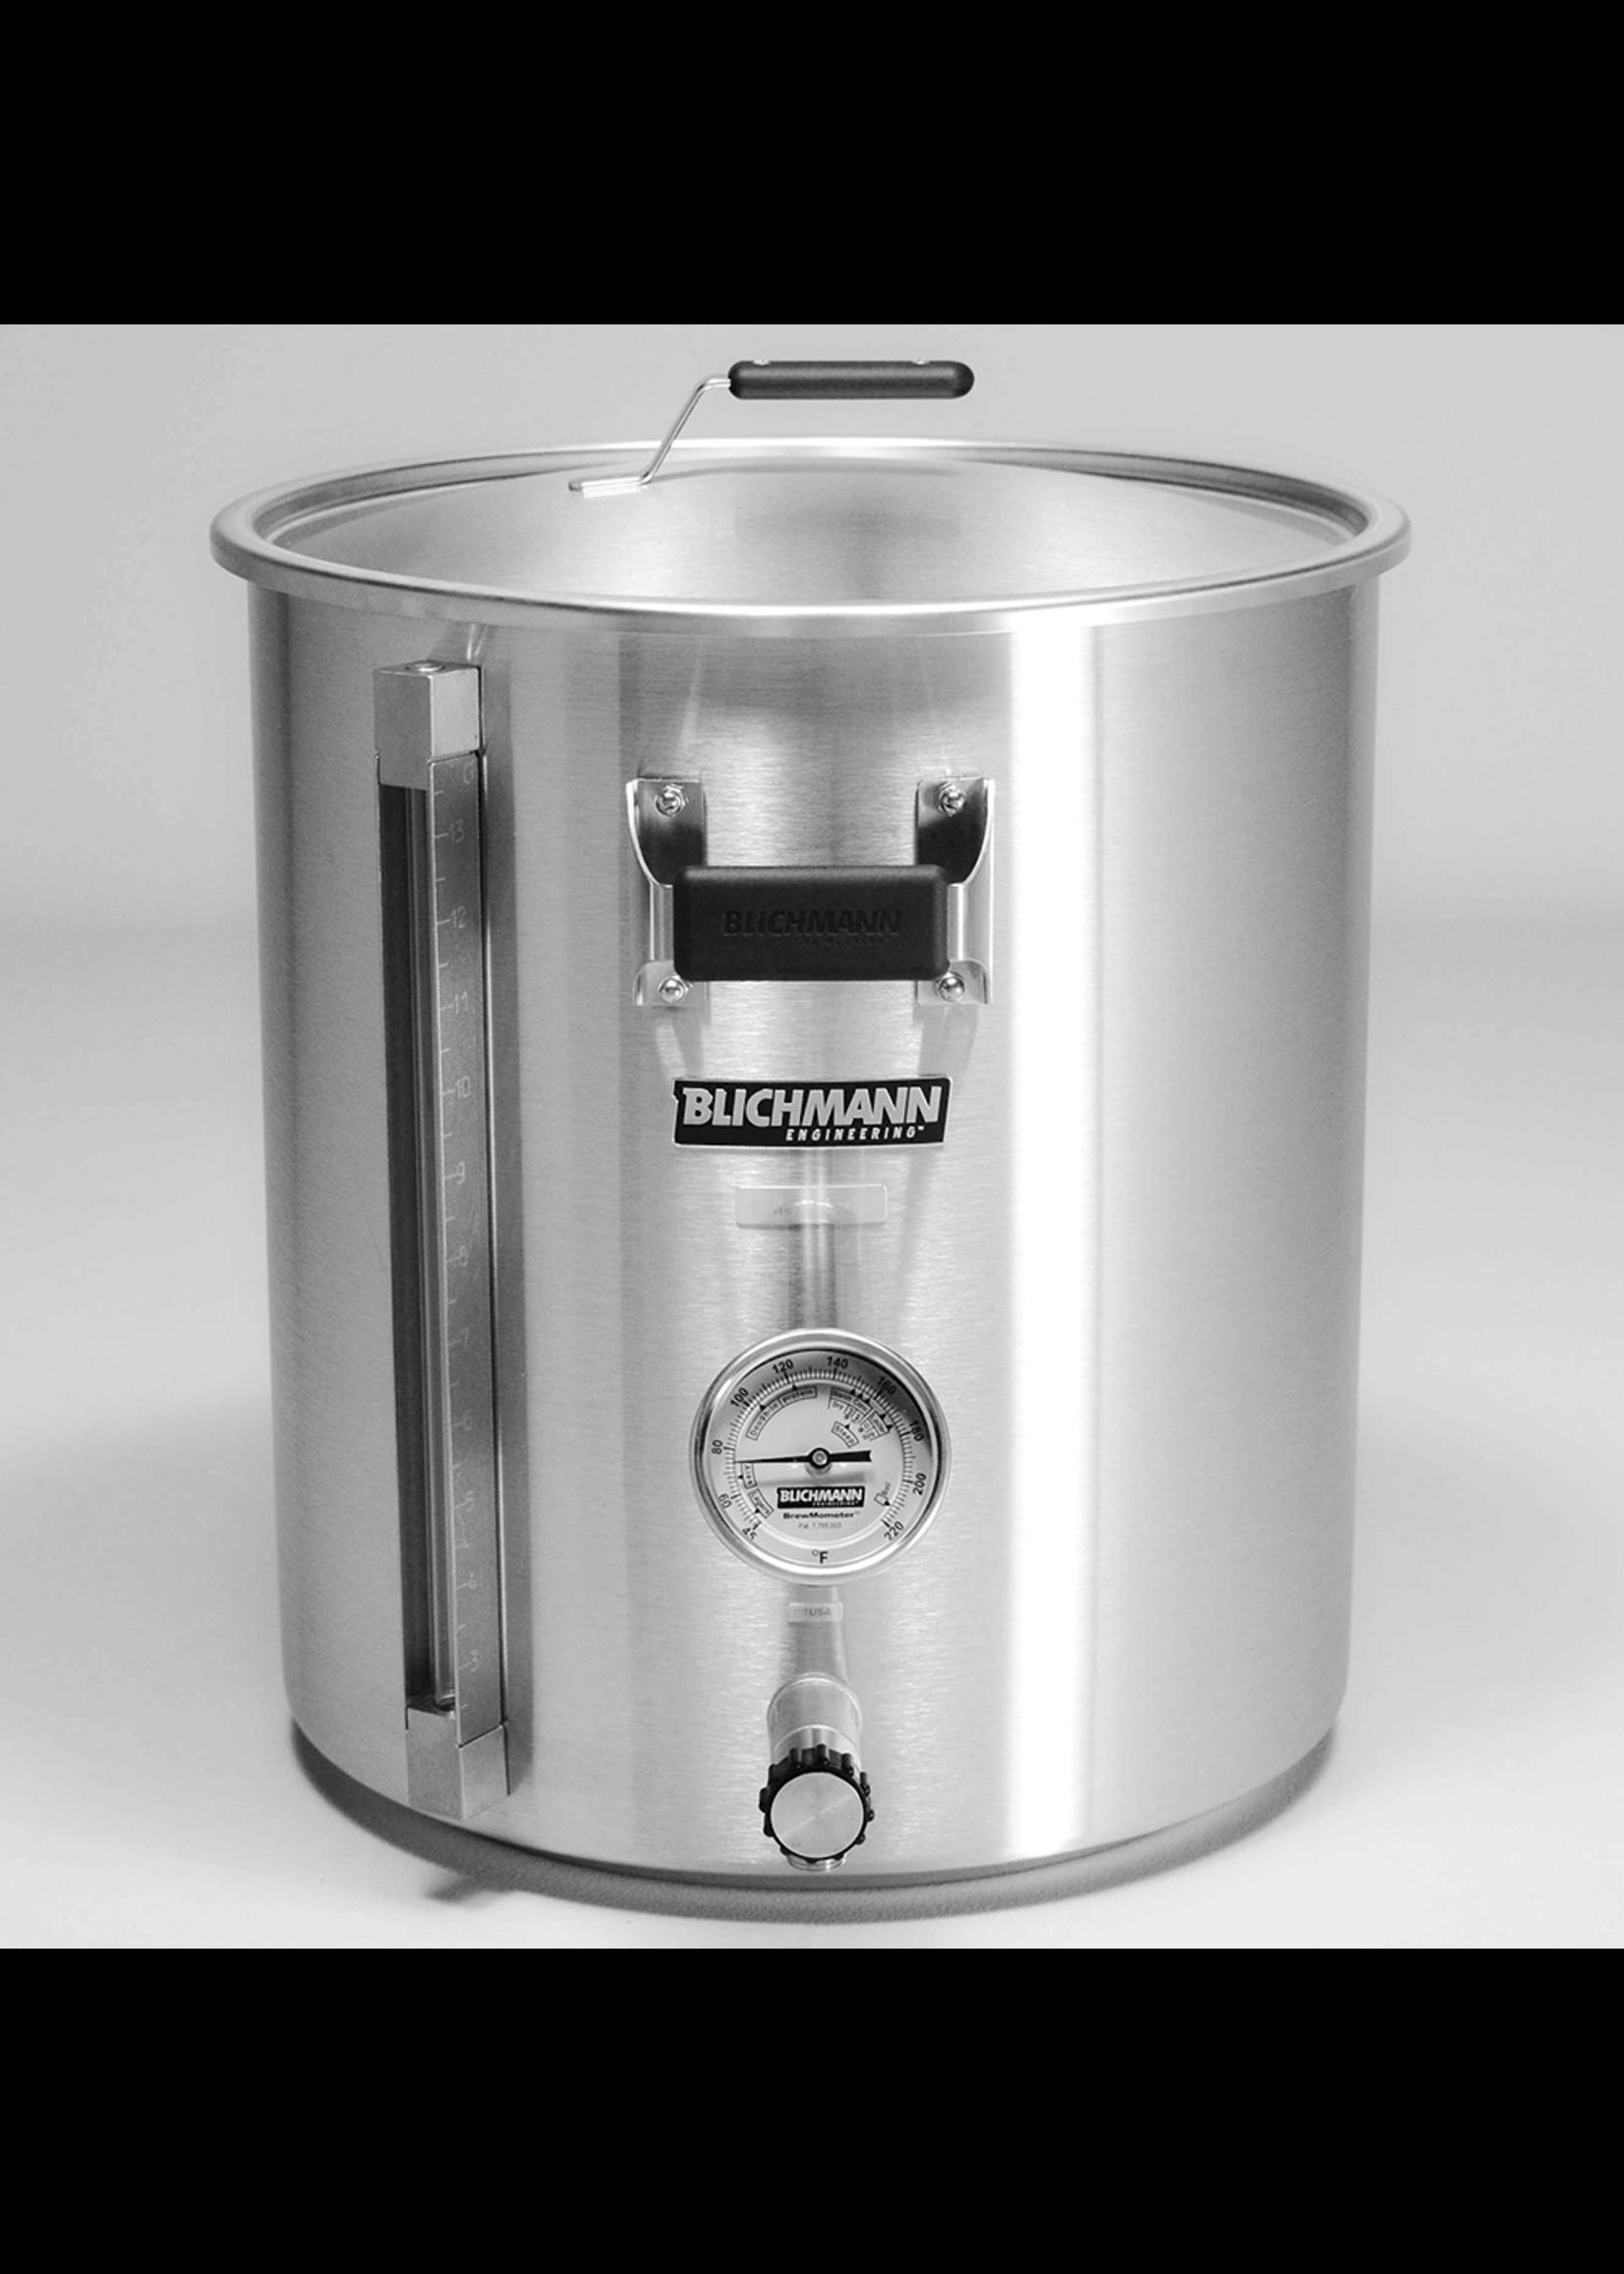 Blichmann Blichmann BoilerMaker G2 - 20 Gallon Standard Brew Kettle (Fahrenheit)